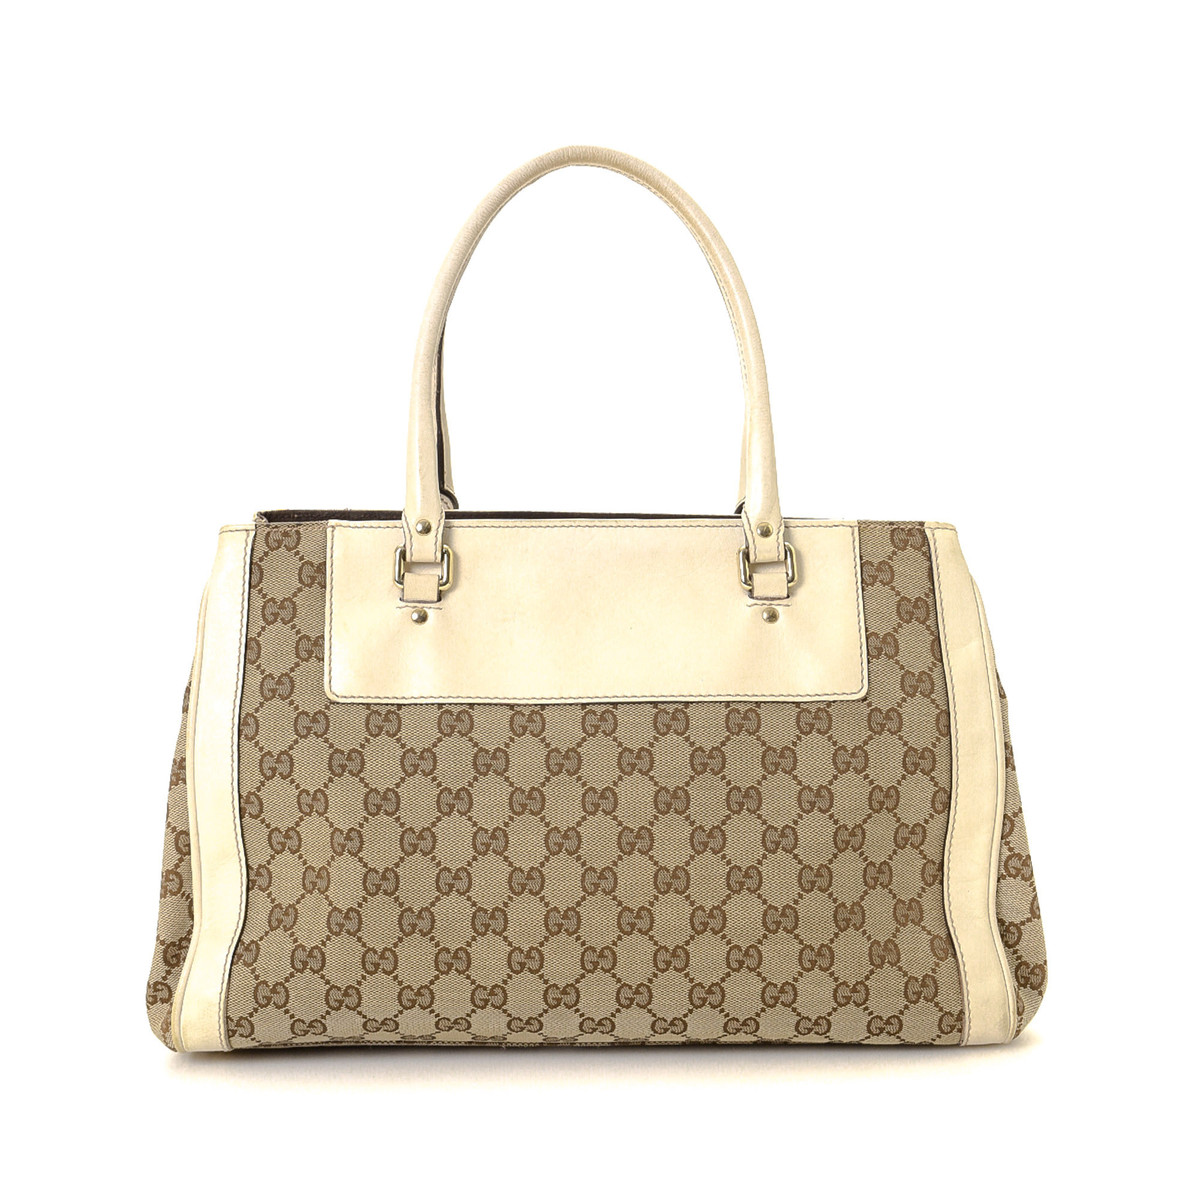 GG Canvas Trophy Handbag